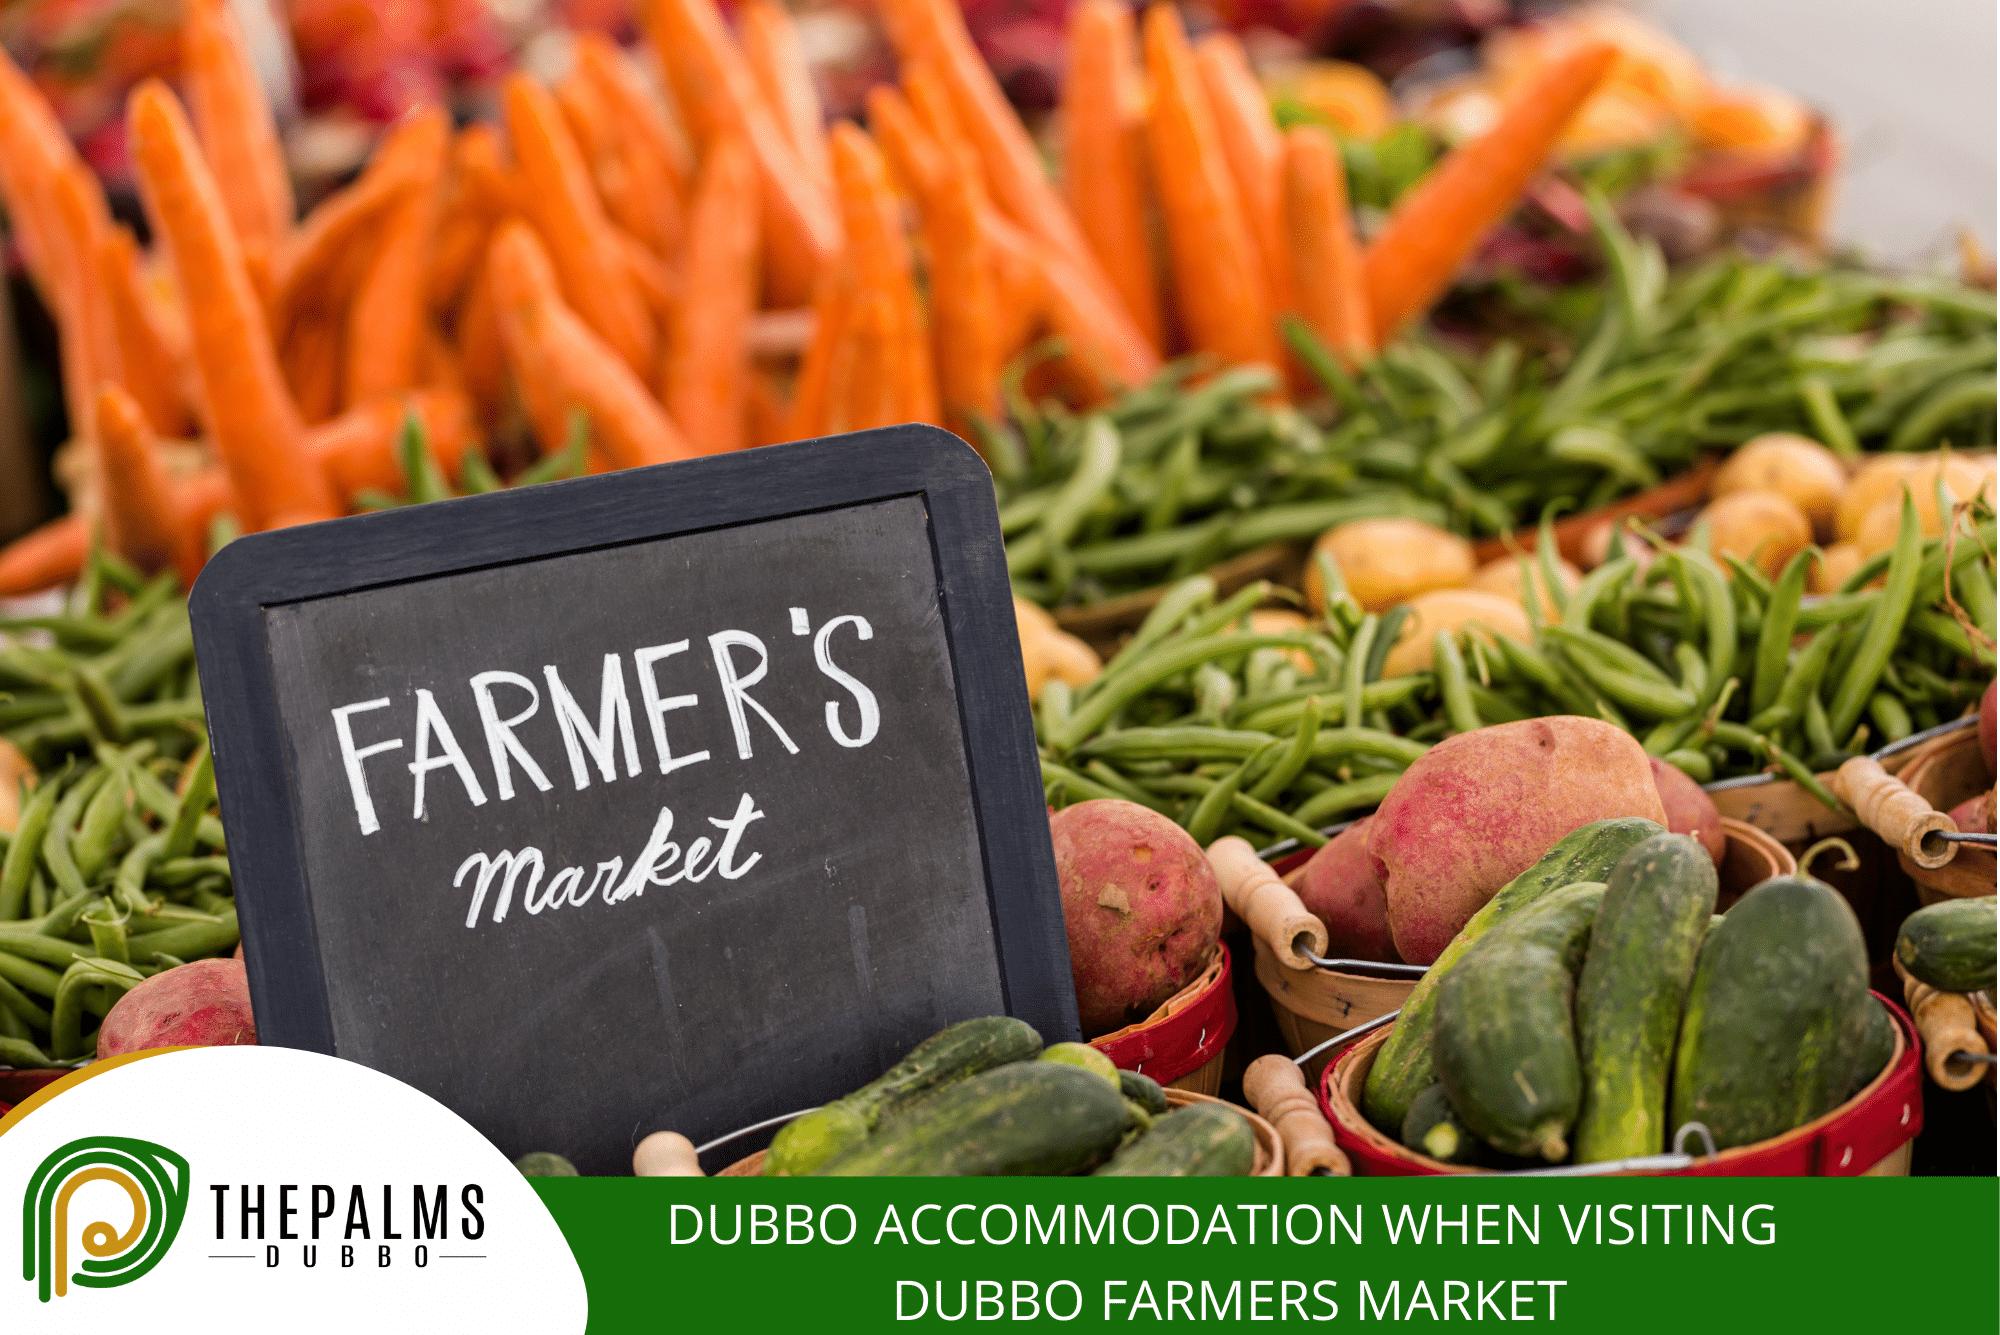 Dubbo Accommodation When Visiting Dubbo Farmers Market